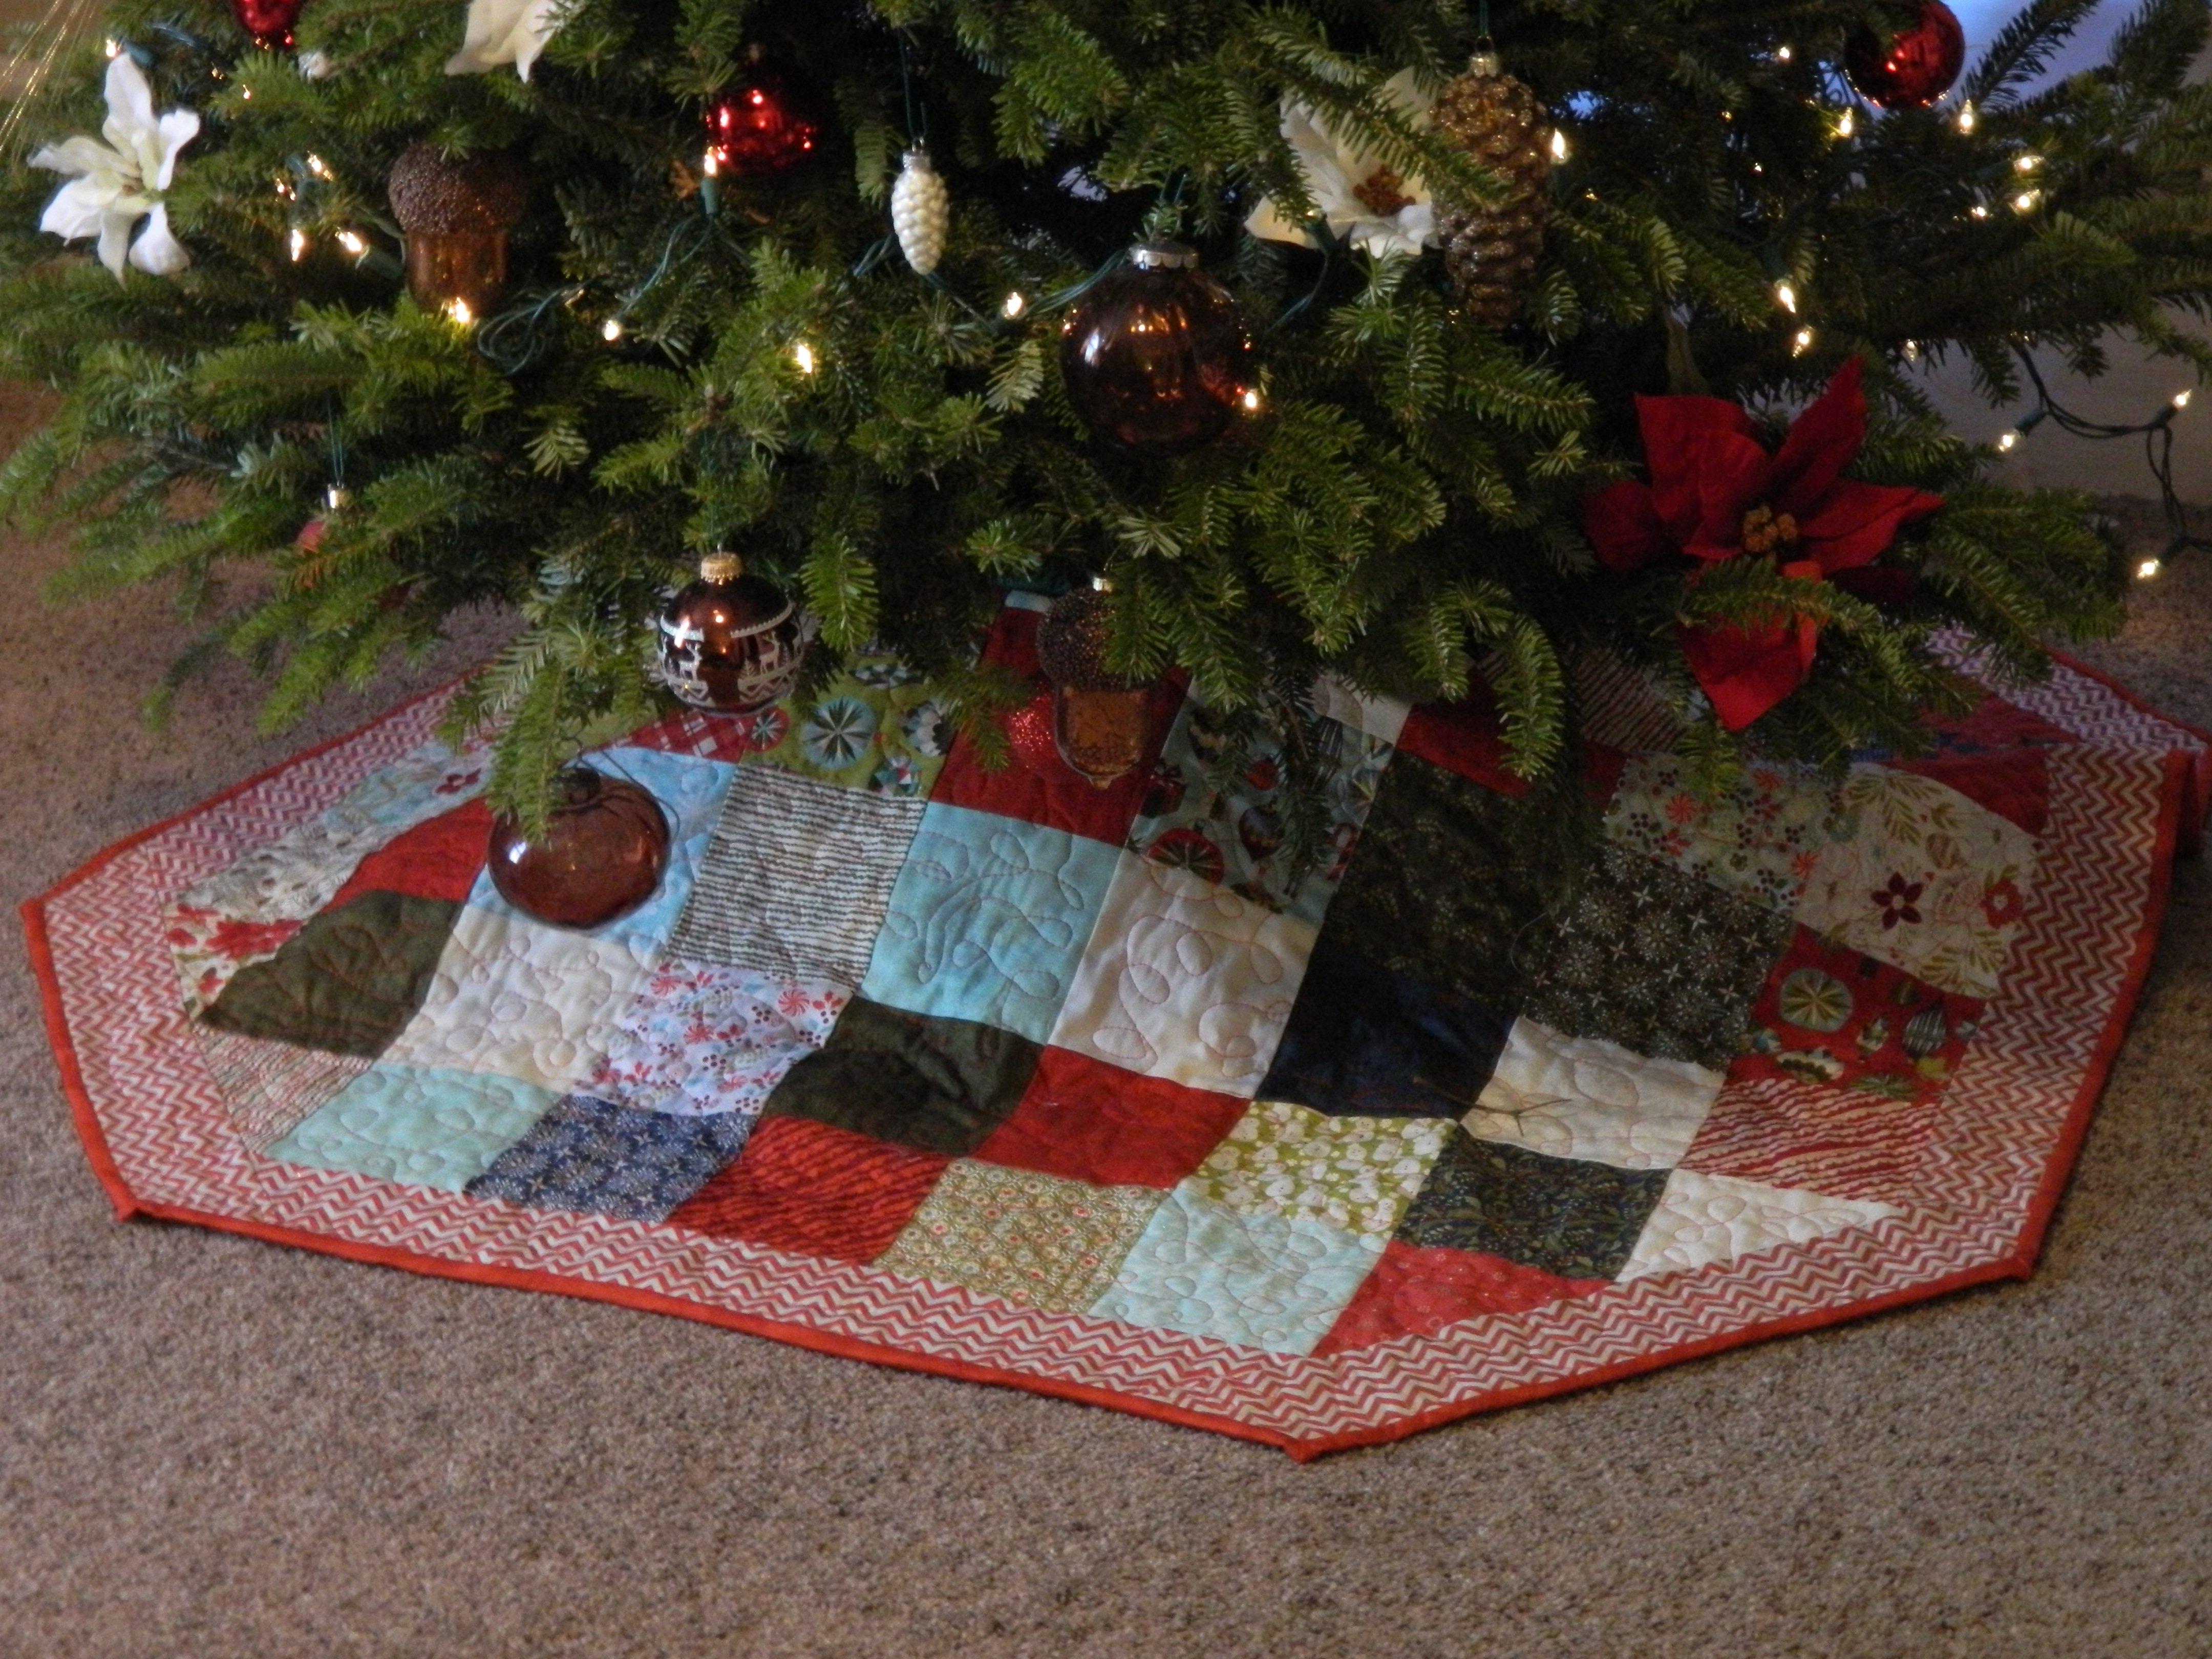 Christmas Tree Skirt Patterns Free.Free Quilted Christmas Tree Skirt Pattern Finished